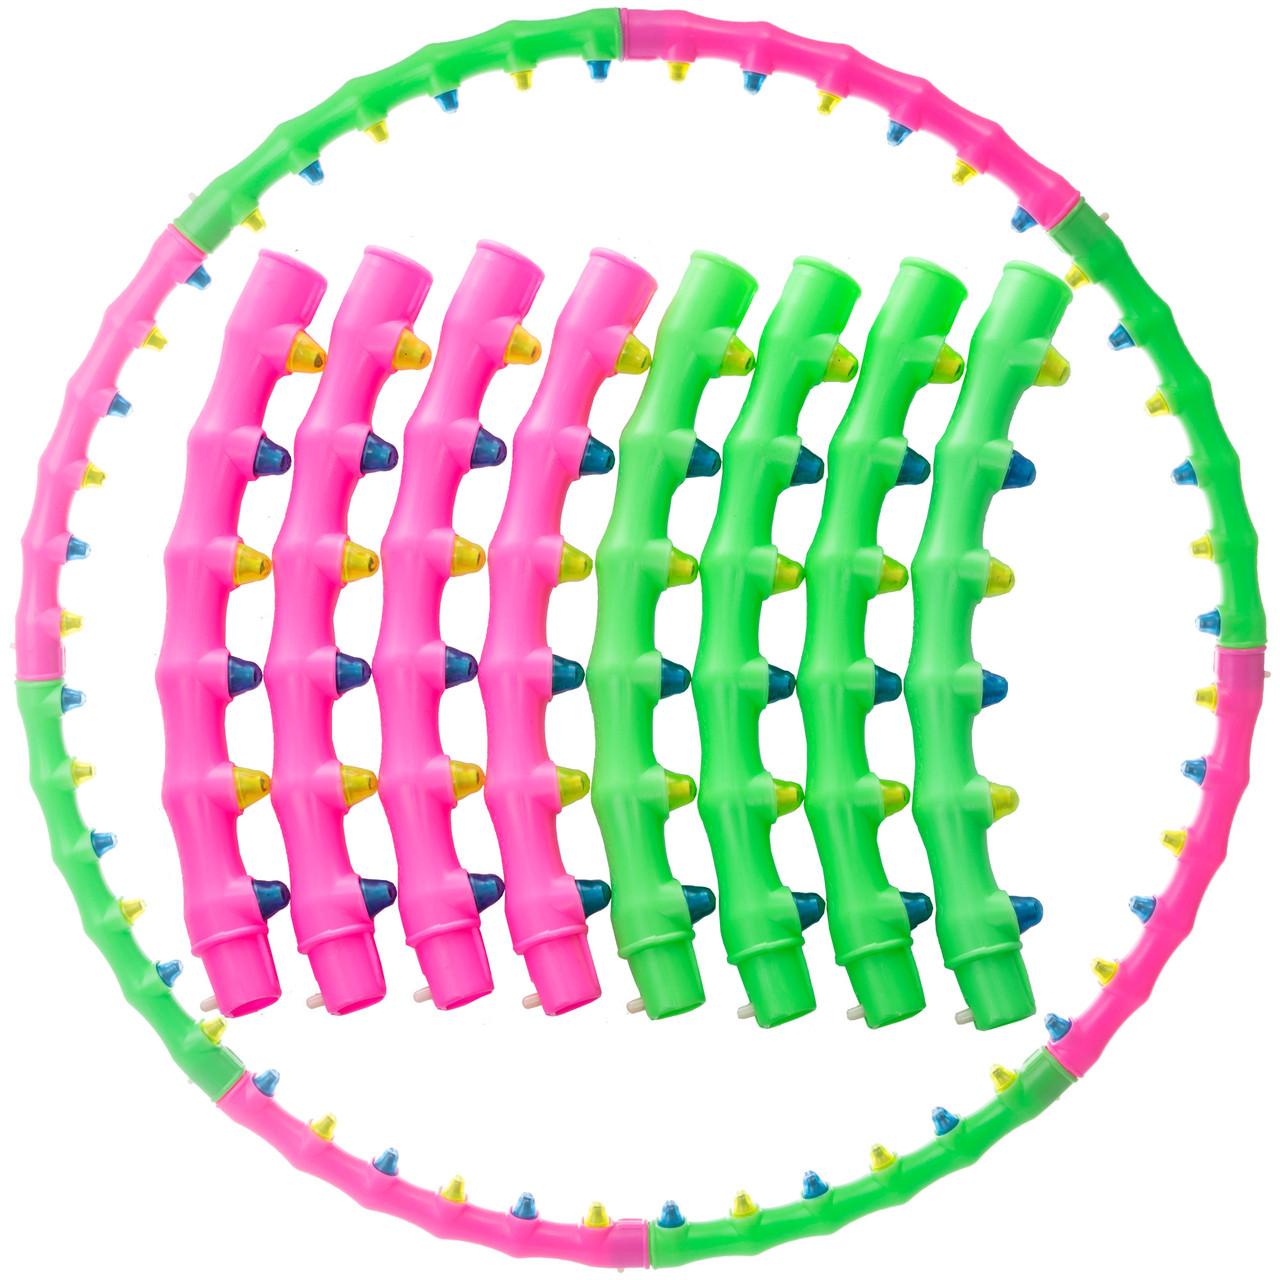 Обруч массажный Хула Хуп Zelart Hula Hoop DOUBLE GRACE MAGNETIC JS-6005 (пластик, 8 секций с магнитами,